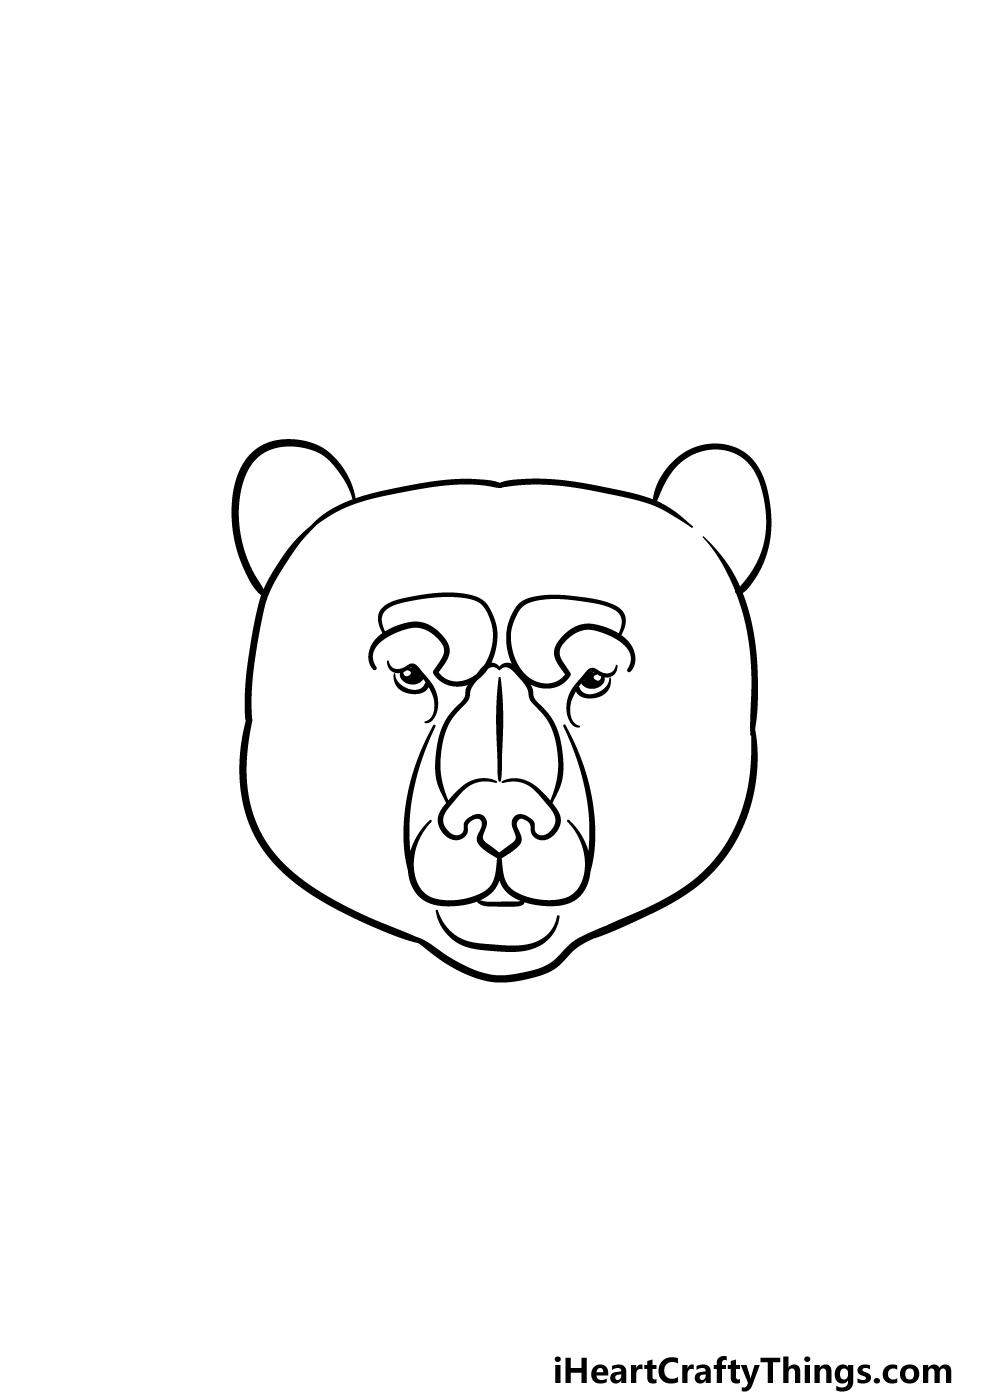 drawing a bear face step 3